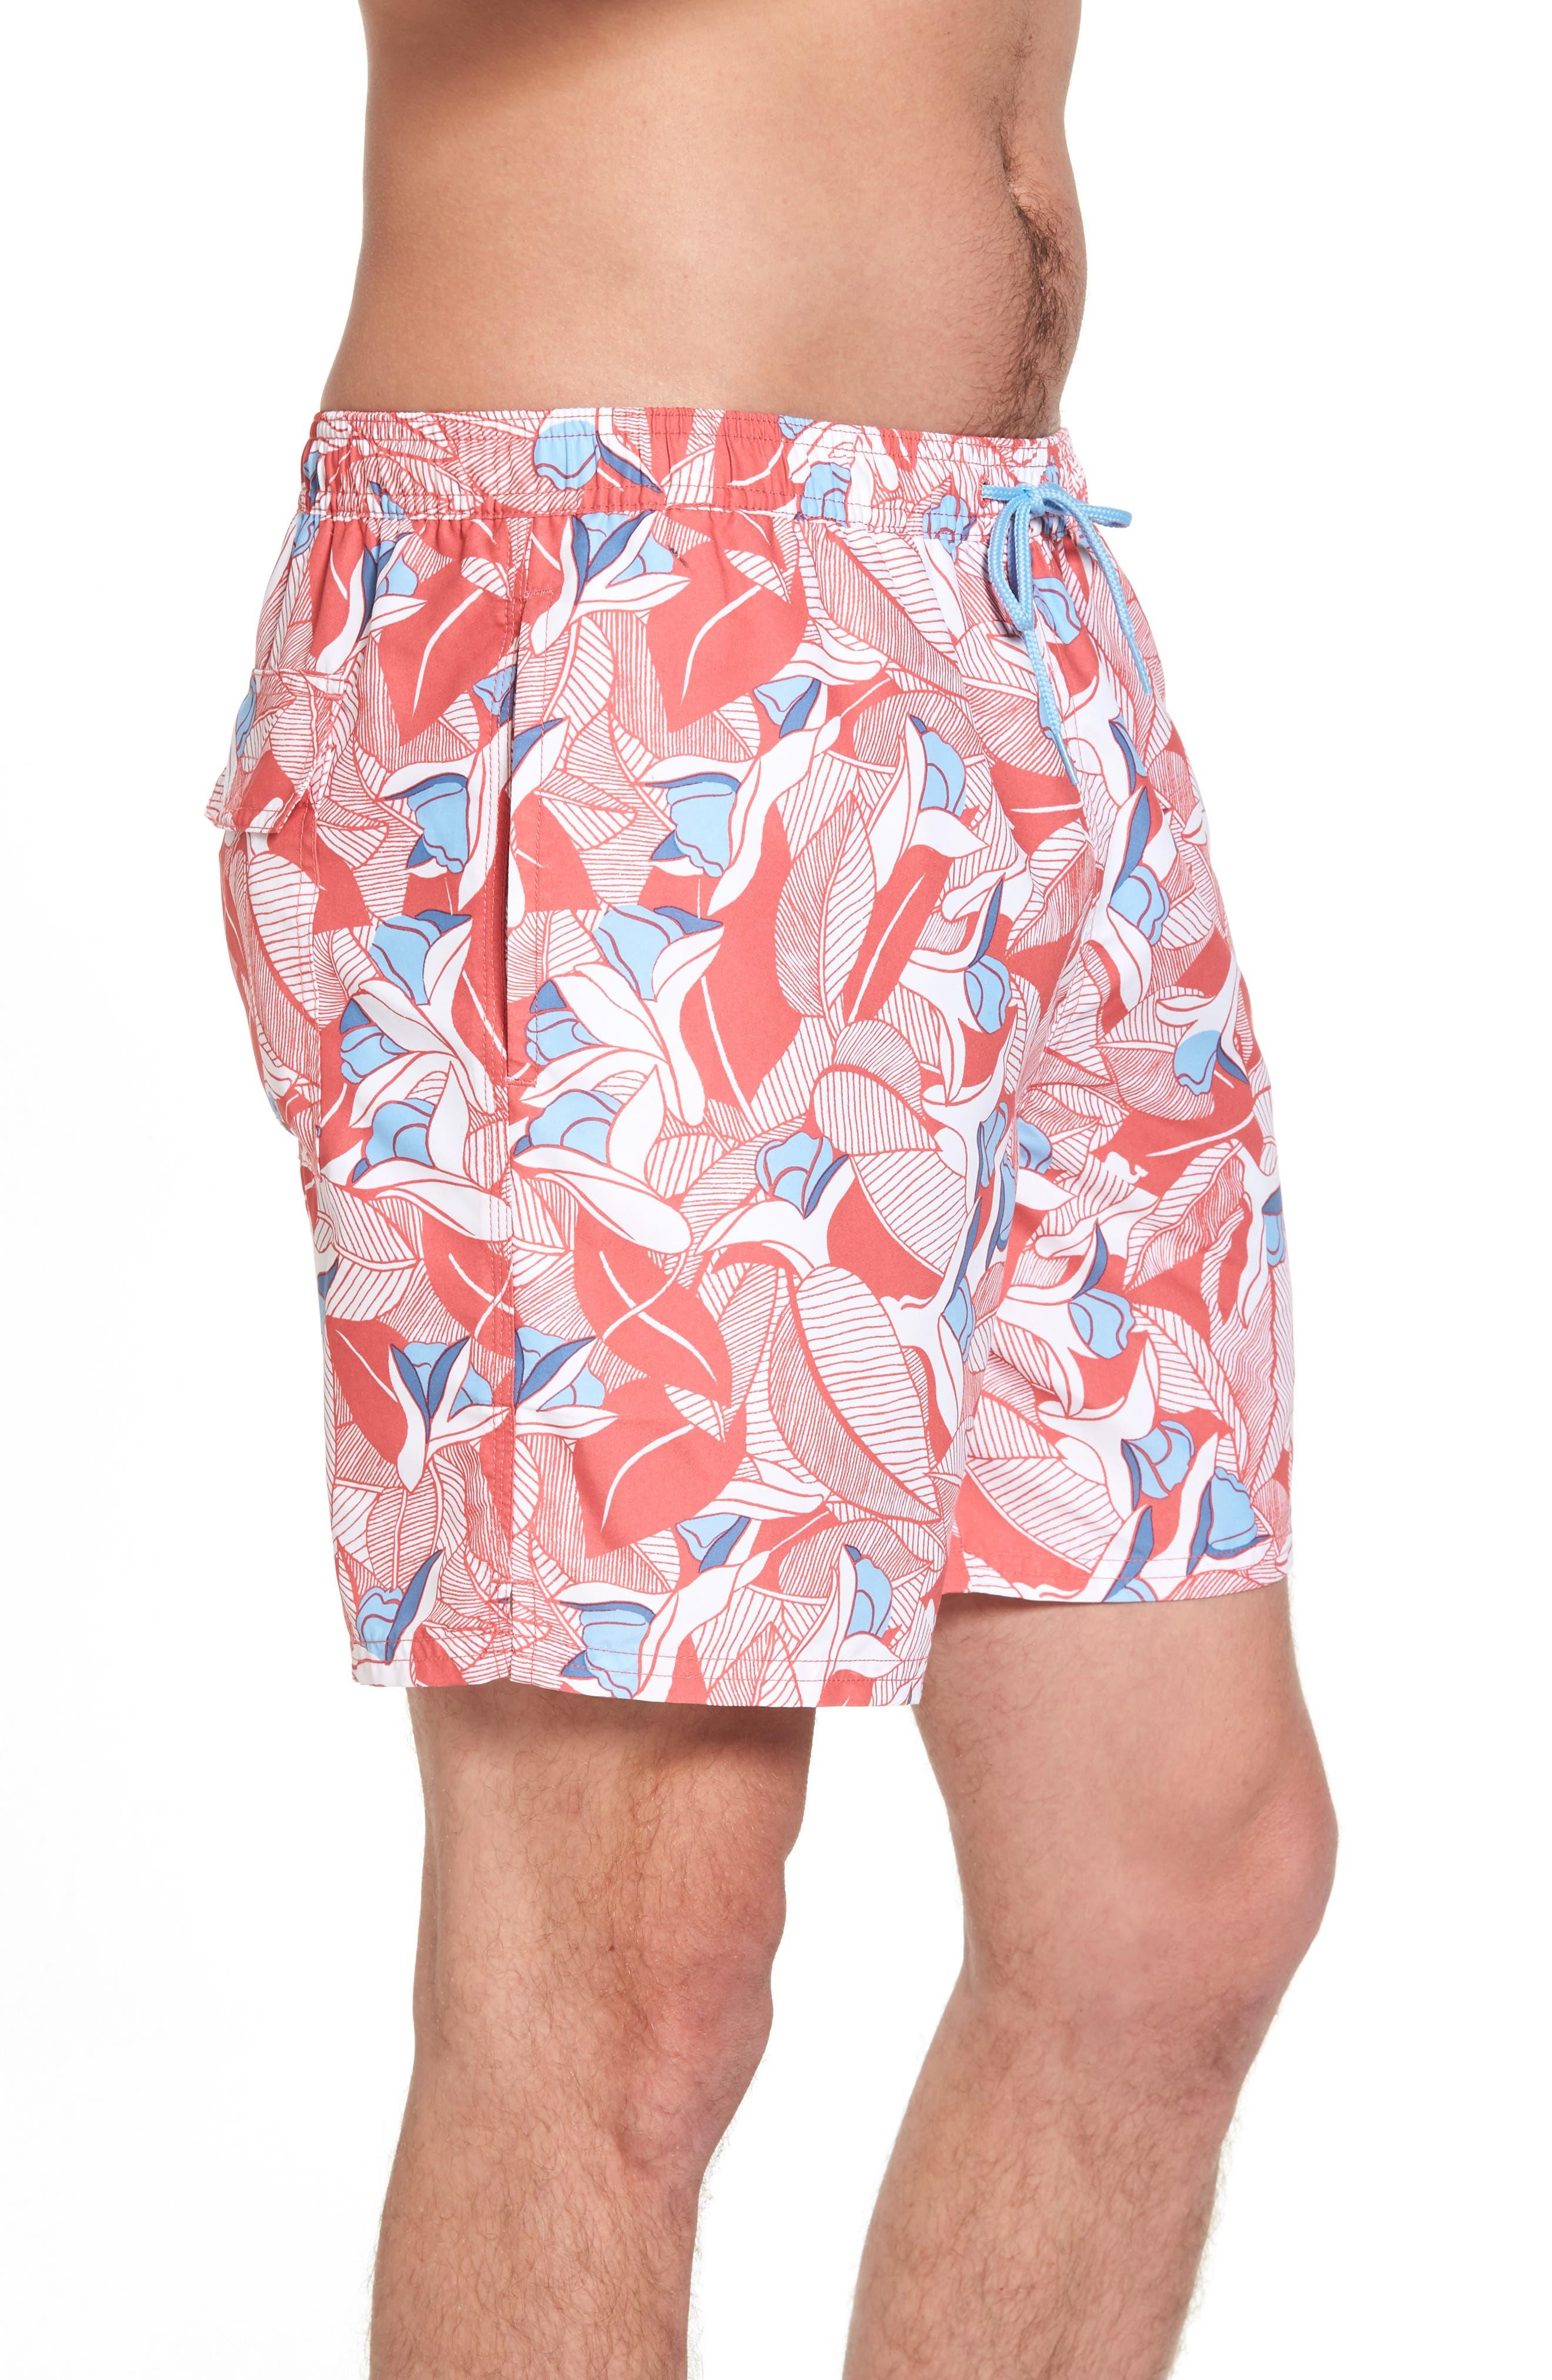 Chappy Floral Swim Trunks,                             Alternate thumbnail 3, color,                             628